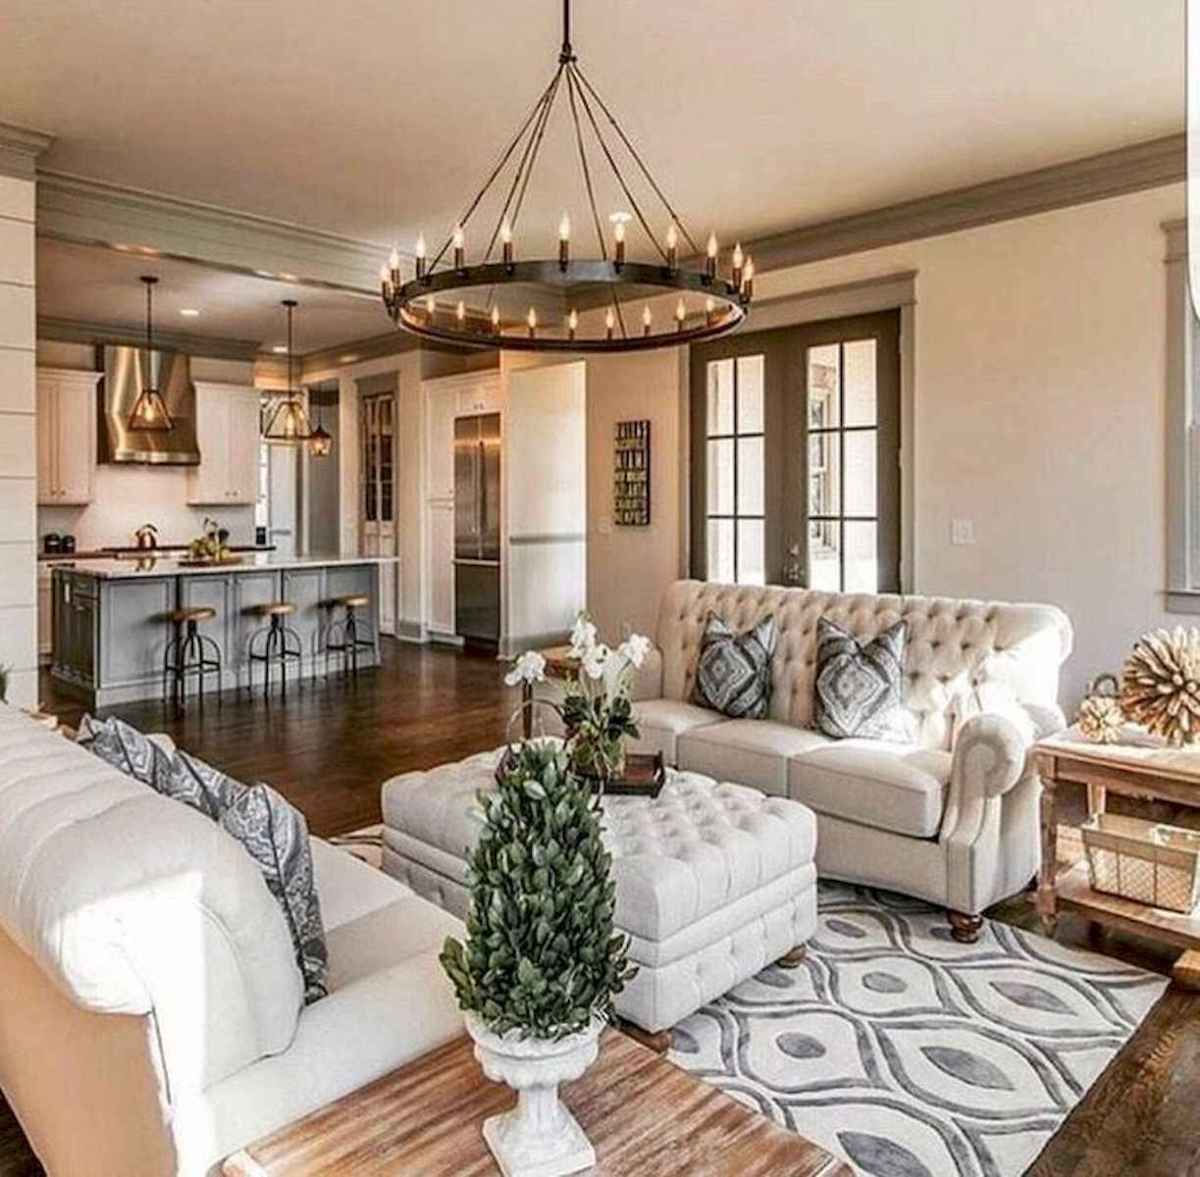 60 Farmhouse Living Room Lighting Ideas Decor And Design (61)